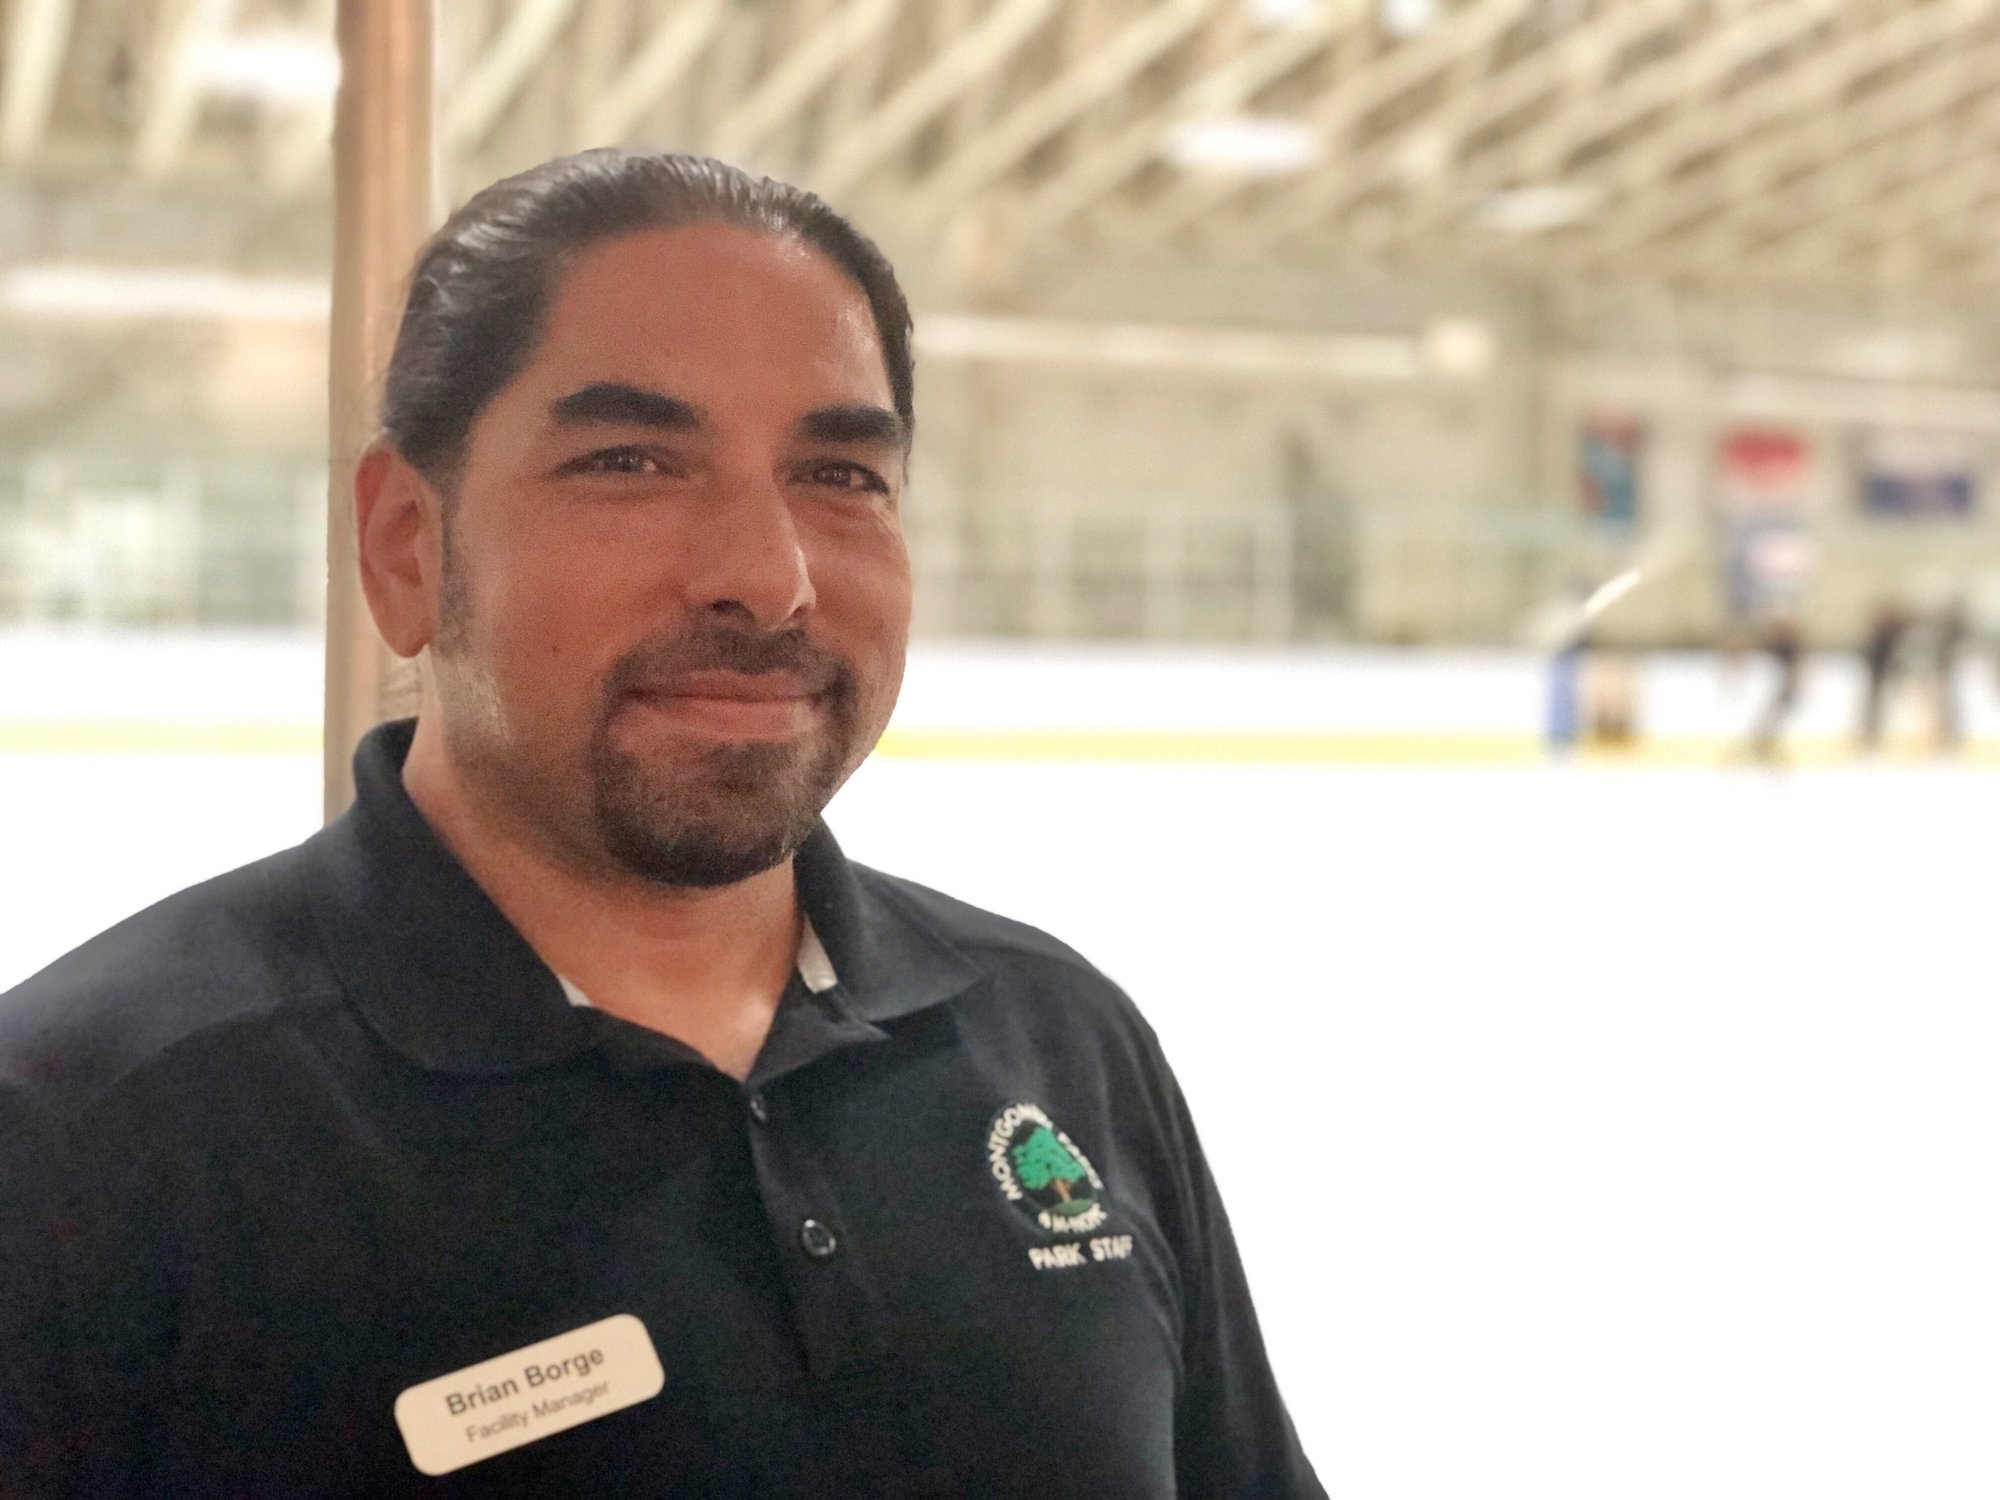 Brian borge, cabin john ice rink